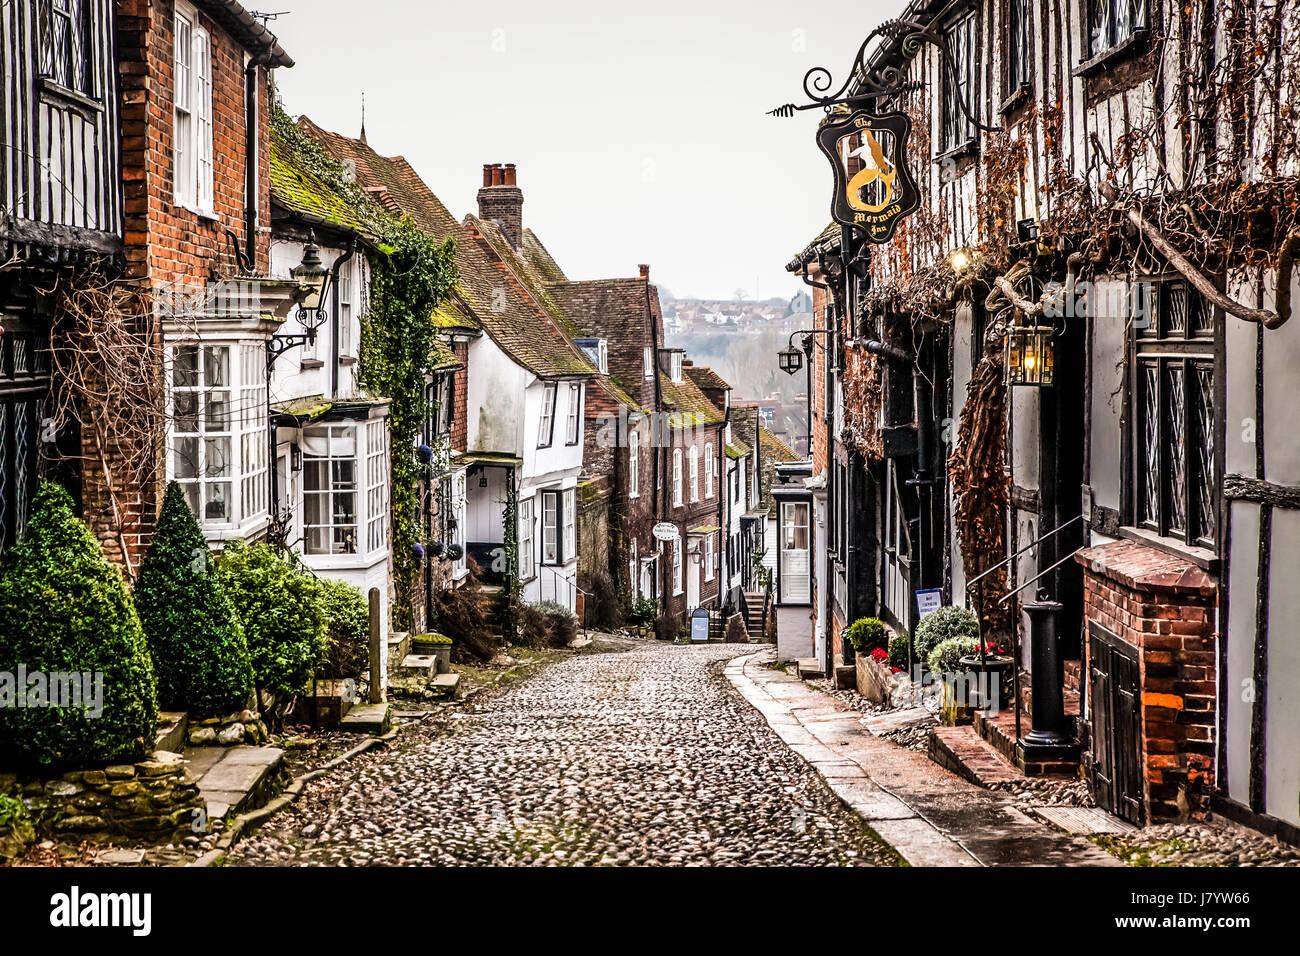 Stock Photo Rye United Kingdom January 21 2017 Pretty Tudor Half Timber Houses 142598014 on Old European Cottages